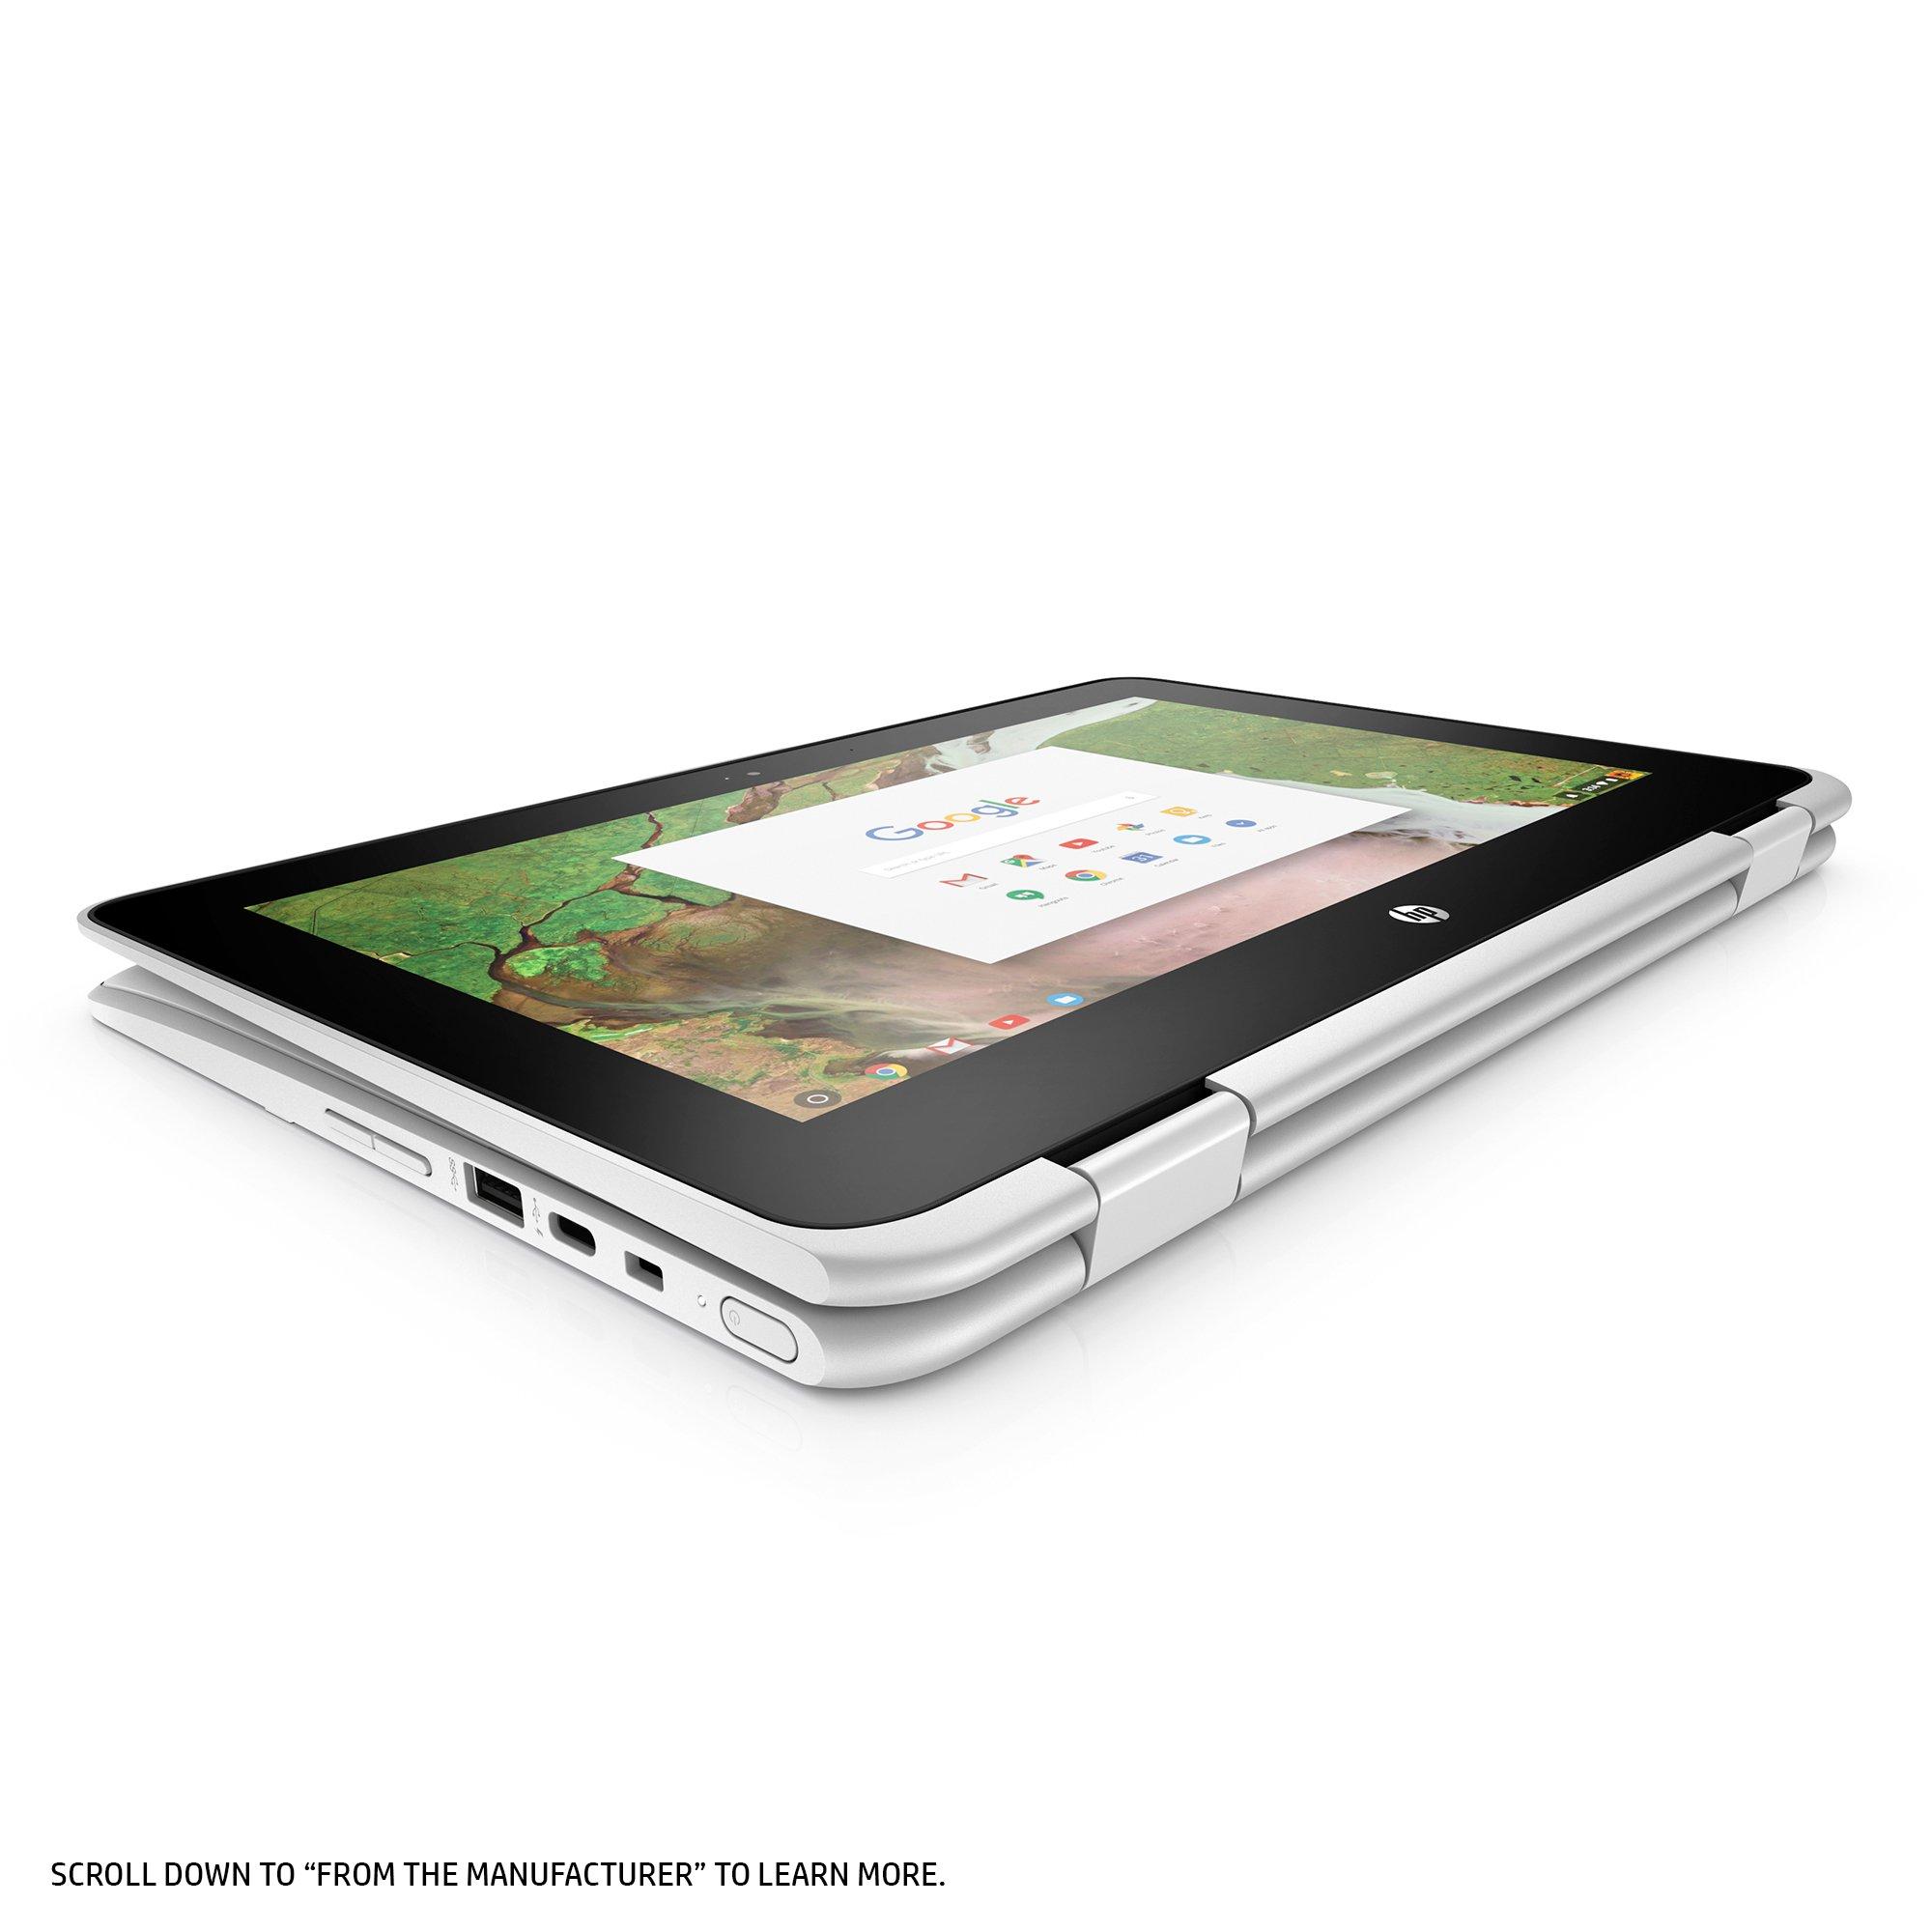 HP Chromebook x360 11-inch Convertible Laptop, Intel Celeron N3350, 4GB RAM, 32GB eMMC storage, Chrome OS (11-ae040nr, White) by HP (Image #4)